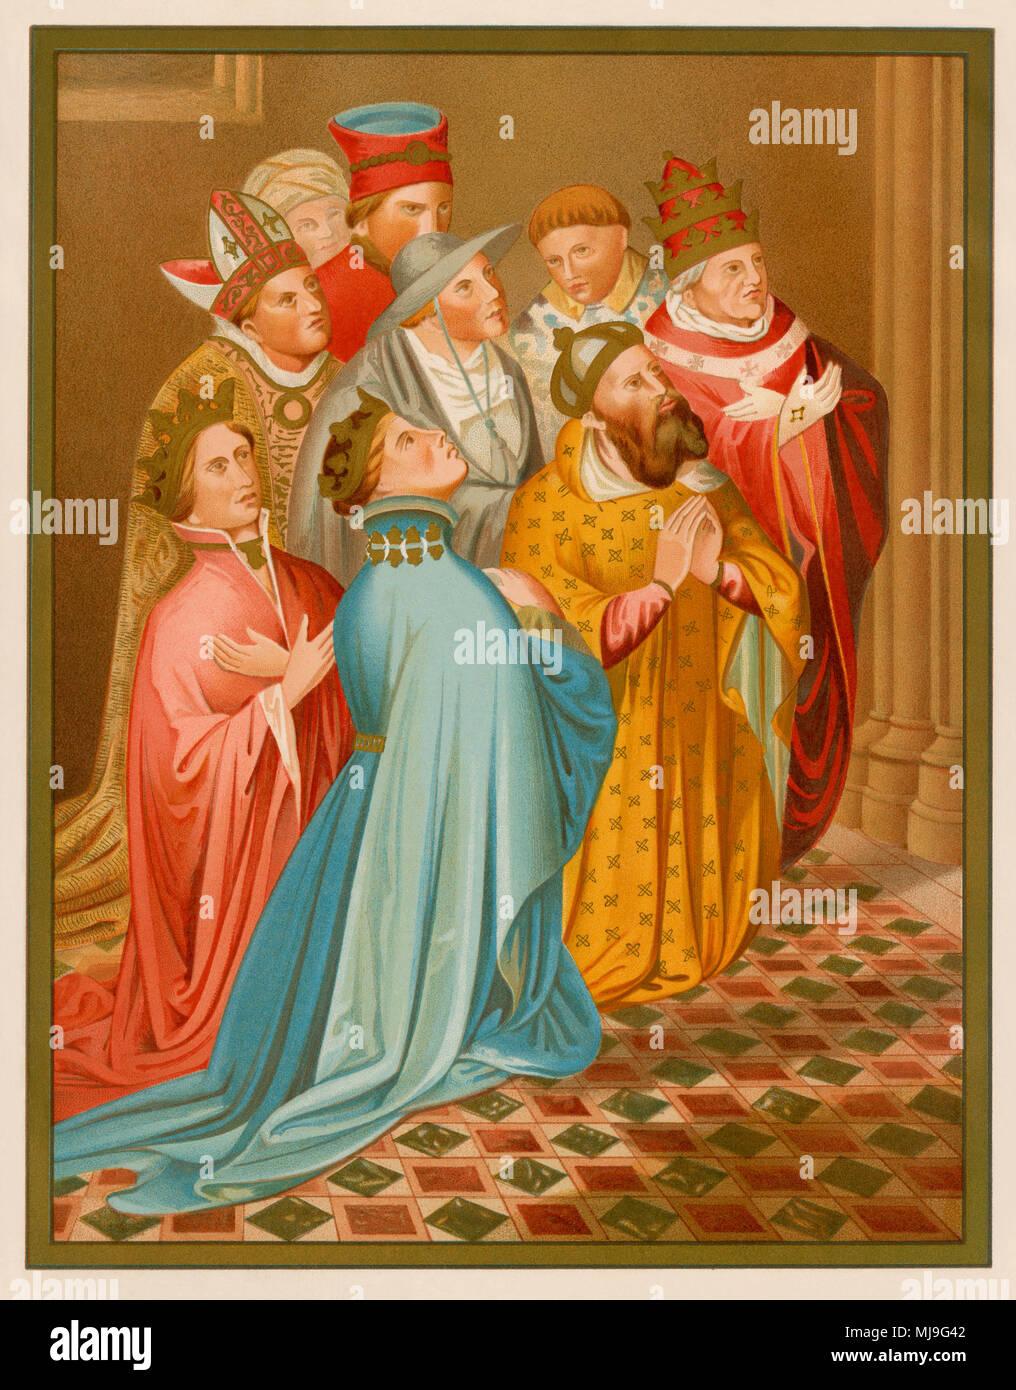 Ferdinand I of Aragon with queen Eleanor of Alburquerque, Emperor Sigismund, and Pope Martin V. Lithograph from Carderera's 'Iconografia Espanola' - Stock Image